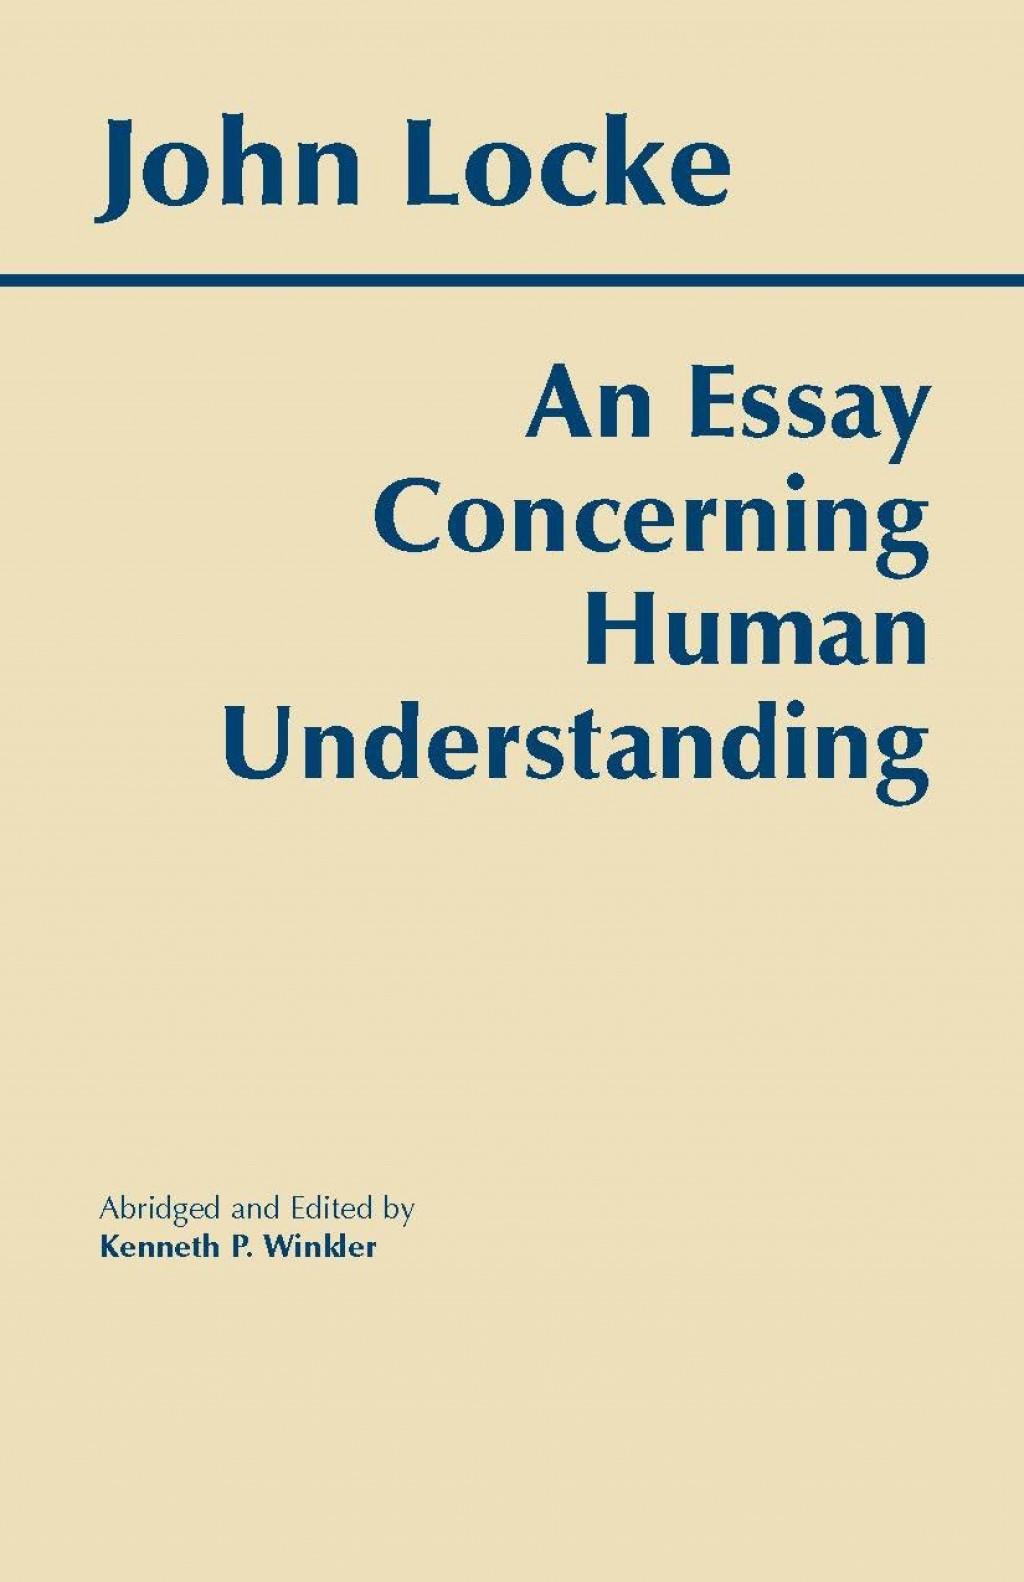 002 An Essay Concerning Human Understanding 61dxvs08kol Stunning Book 2 Chapter 27 Summary Locke Analysis John Tabula Rasa Large